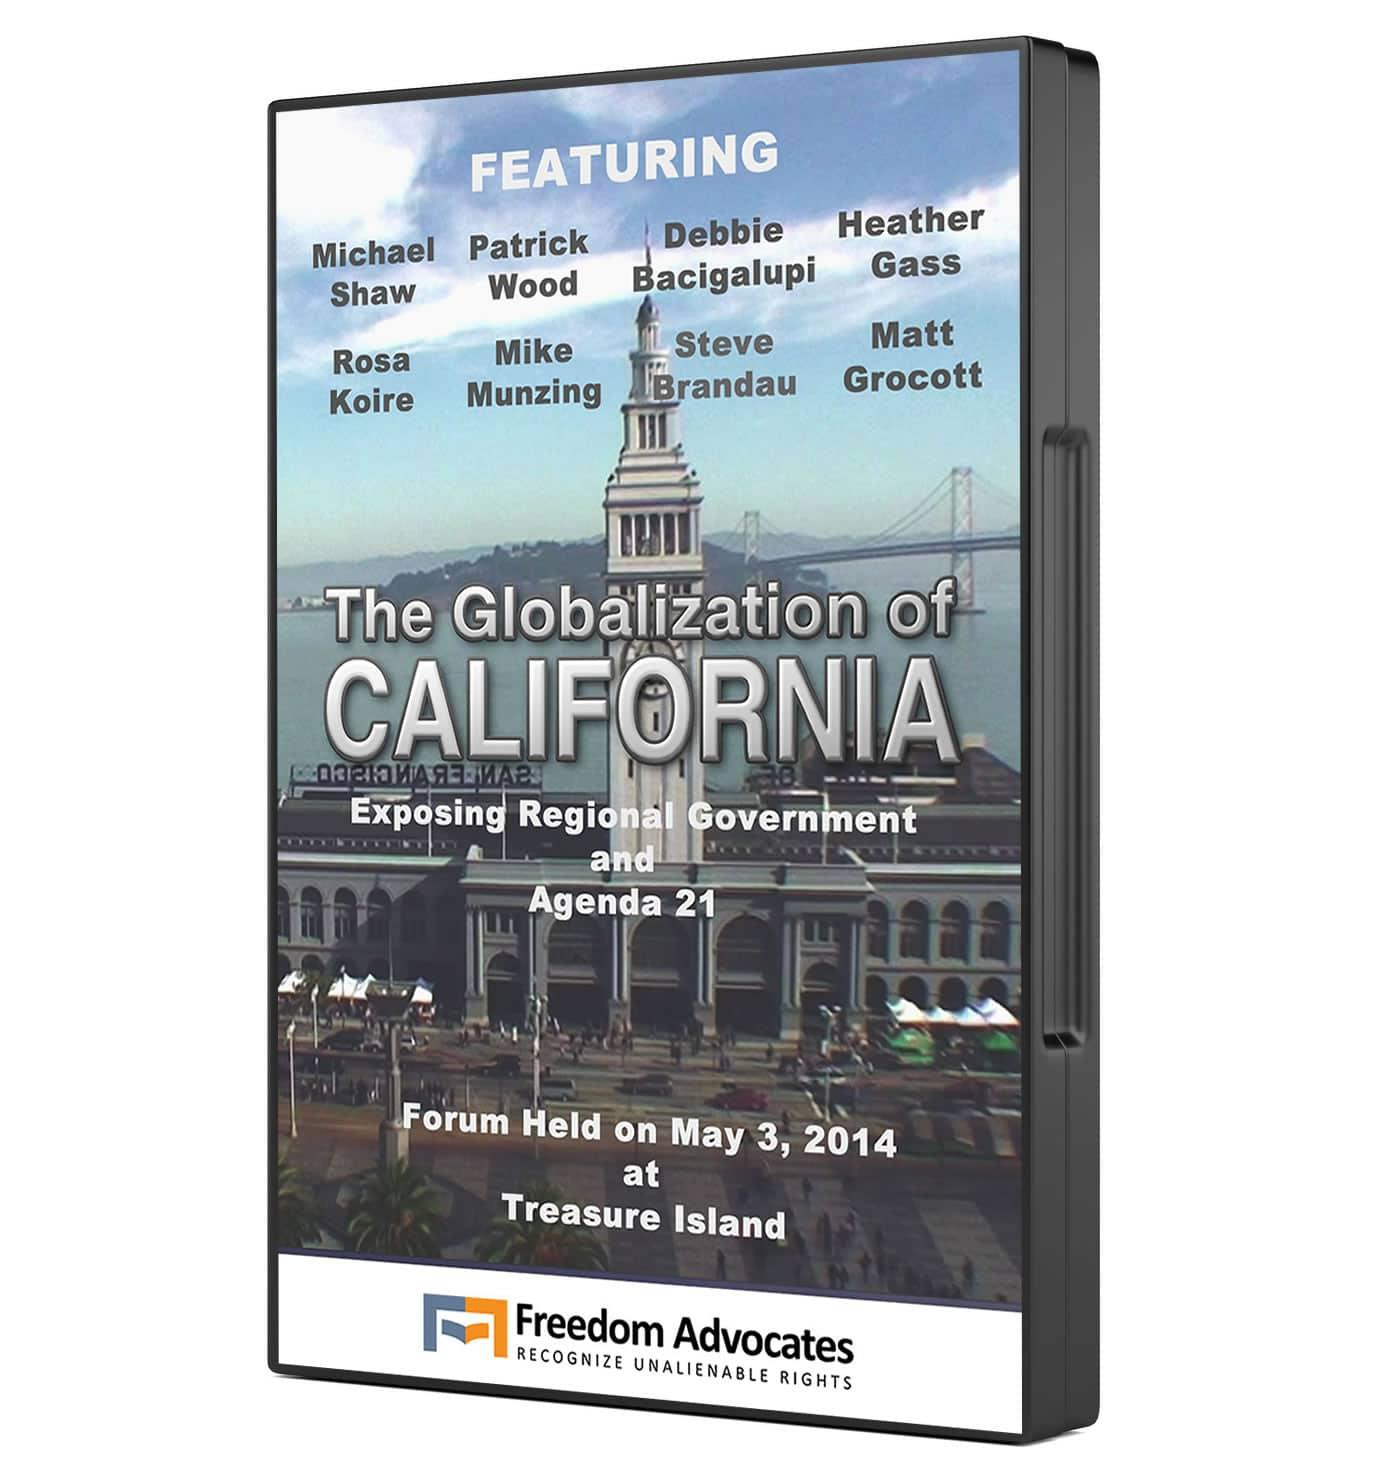 The Globalization of California